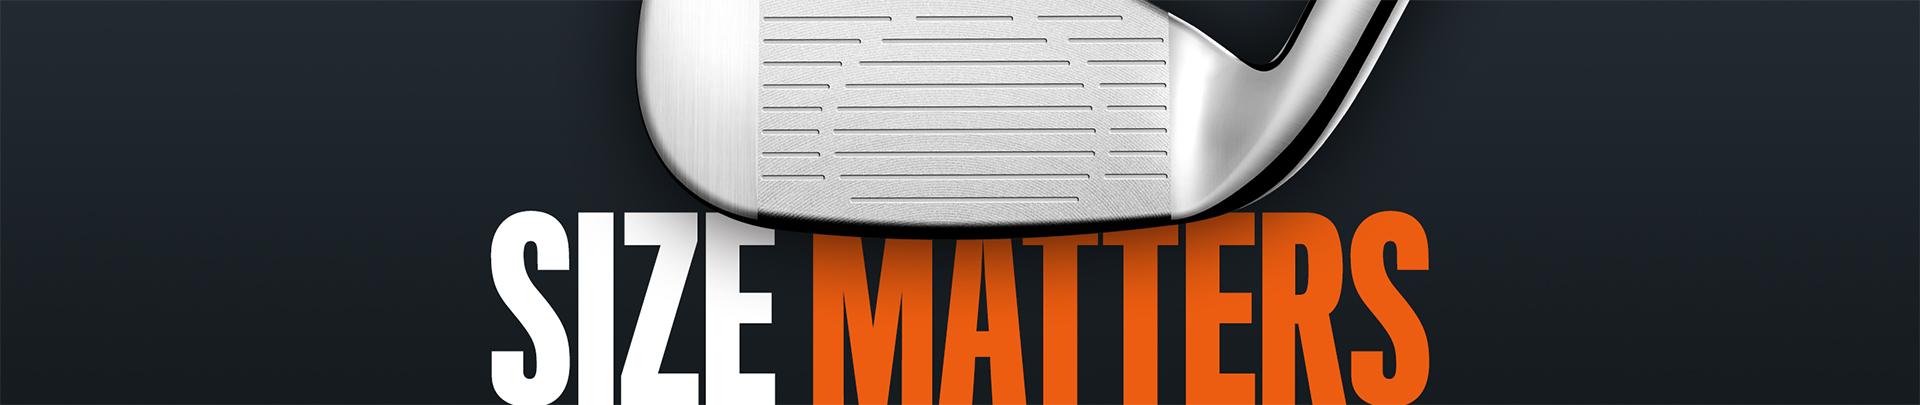 Cobra Golf King Oversize Irons - Size Matters